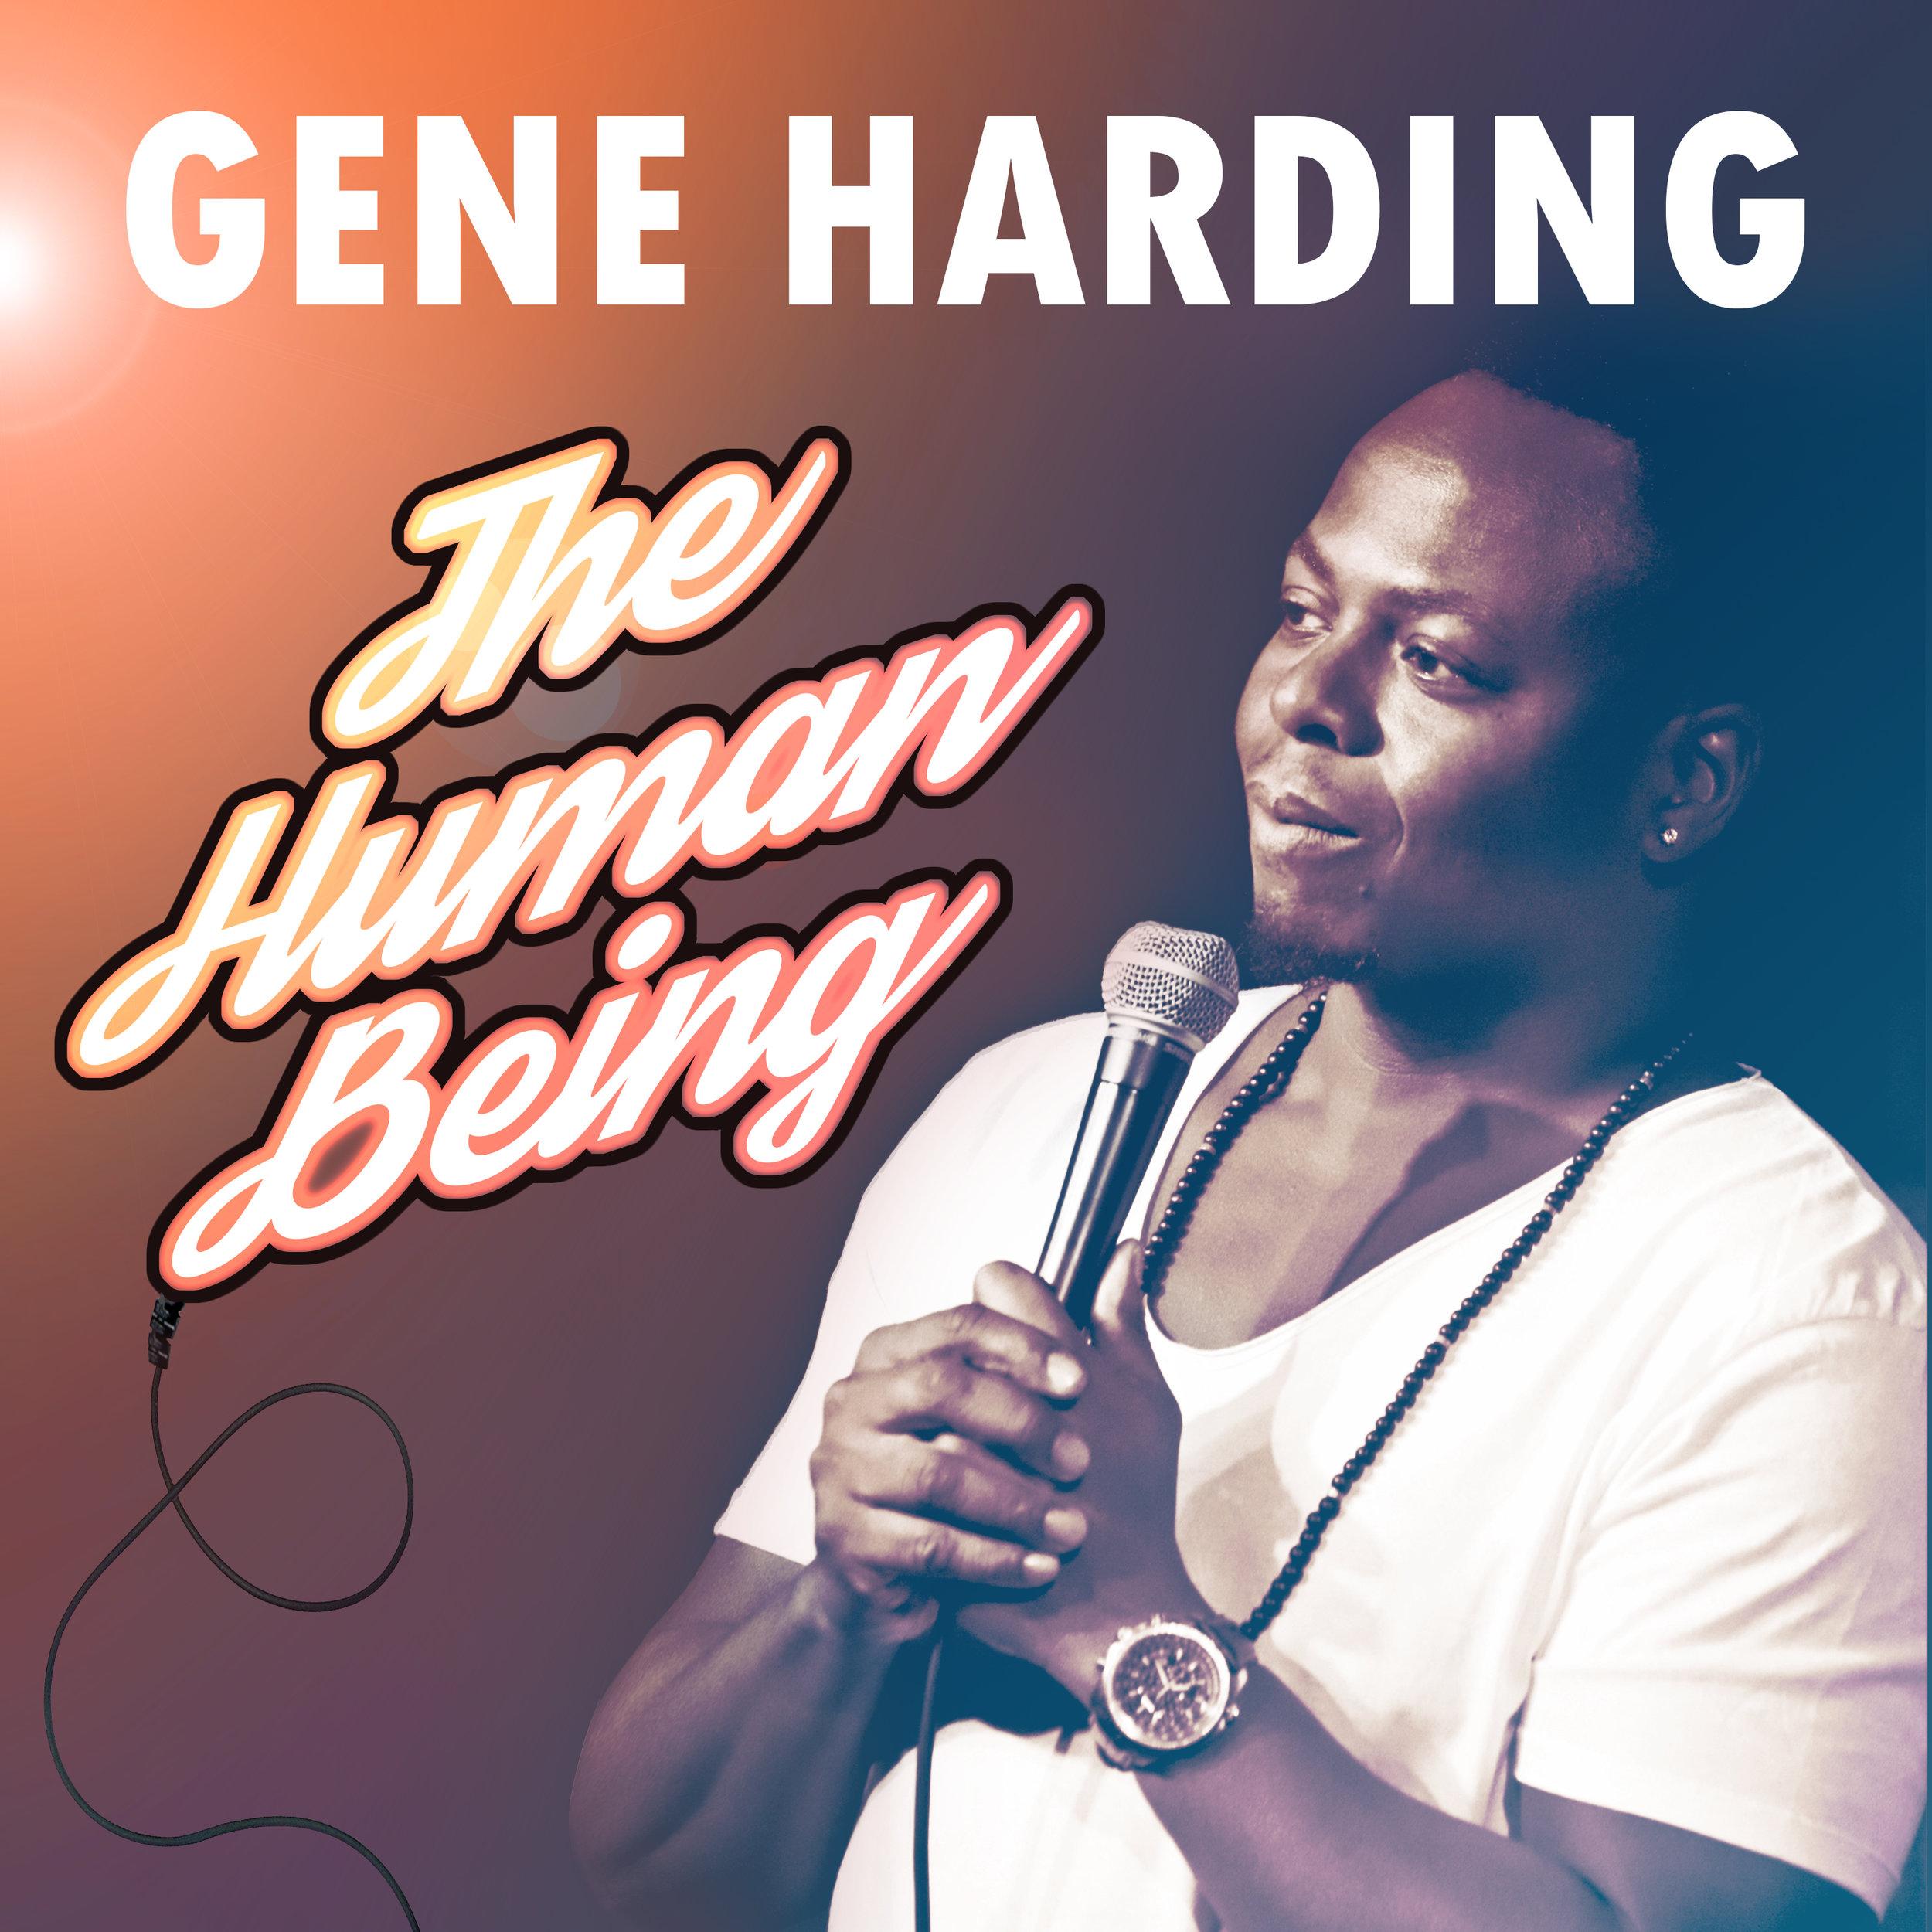 Gene Harding The Human Being.jpg